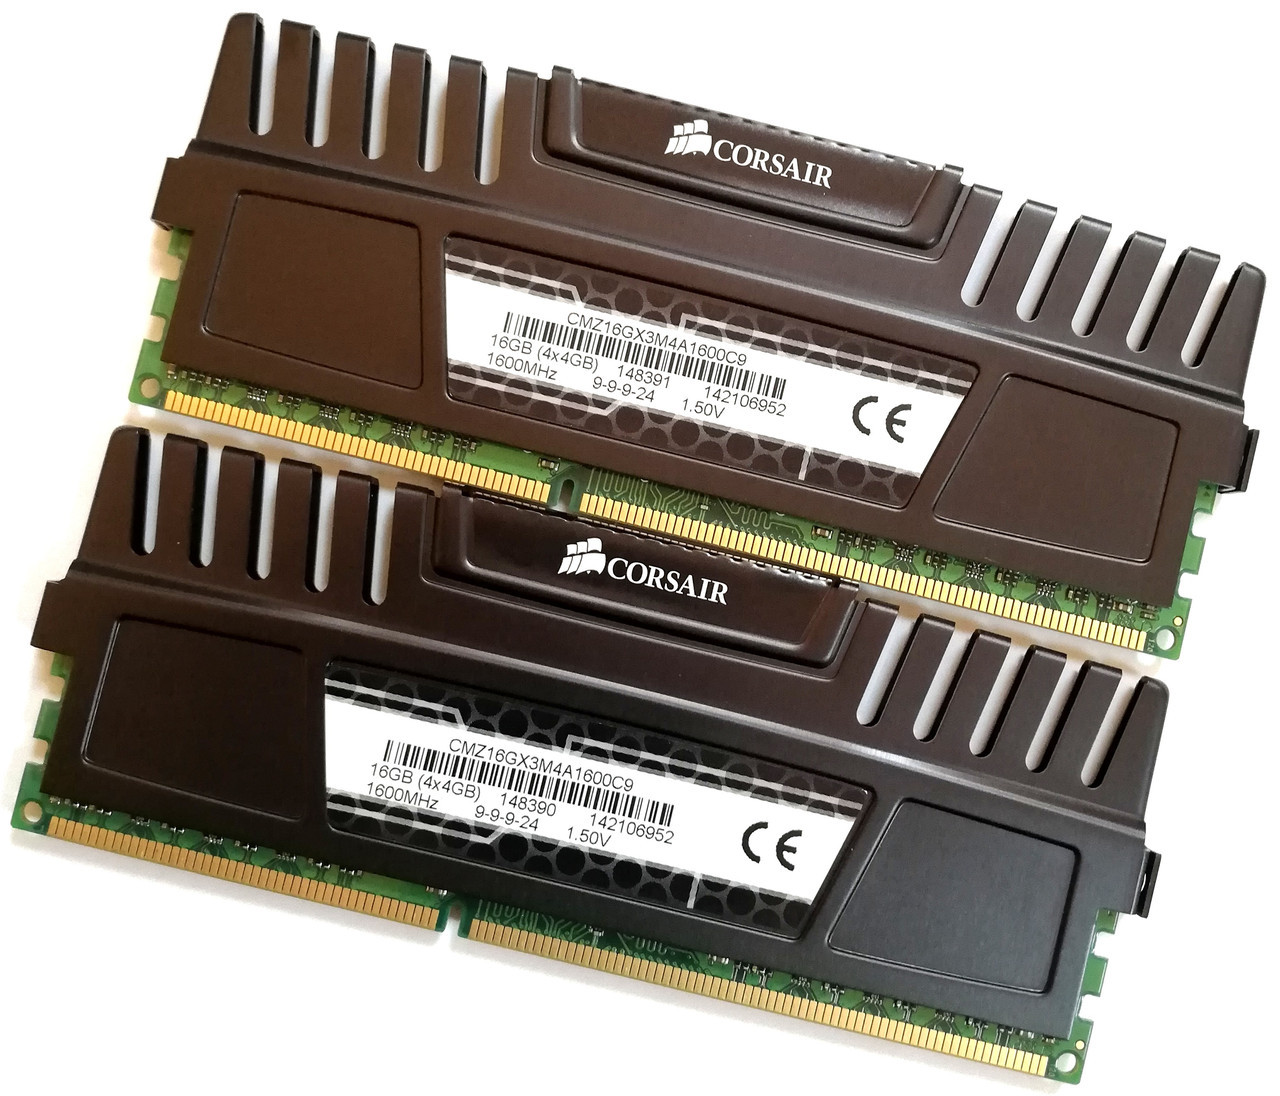 Пара игровой оперативной памяти Corsair DDR3 8Gb (4Gb+4Gb) 1600MHz PC3 12800U 2R8 CL9 (CMZ16GX3M4A1600C9) Б/У